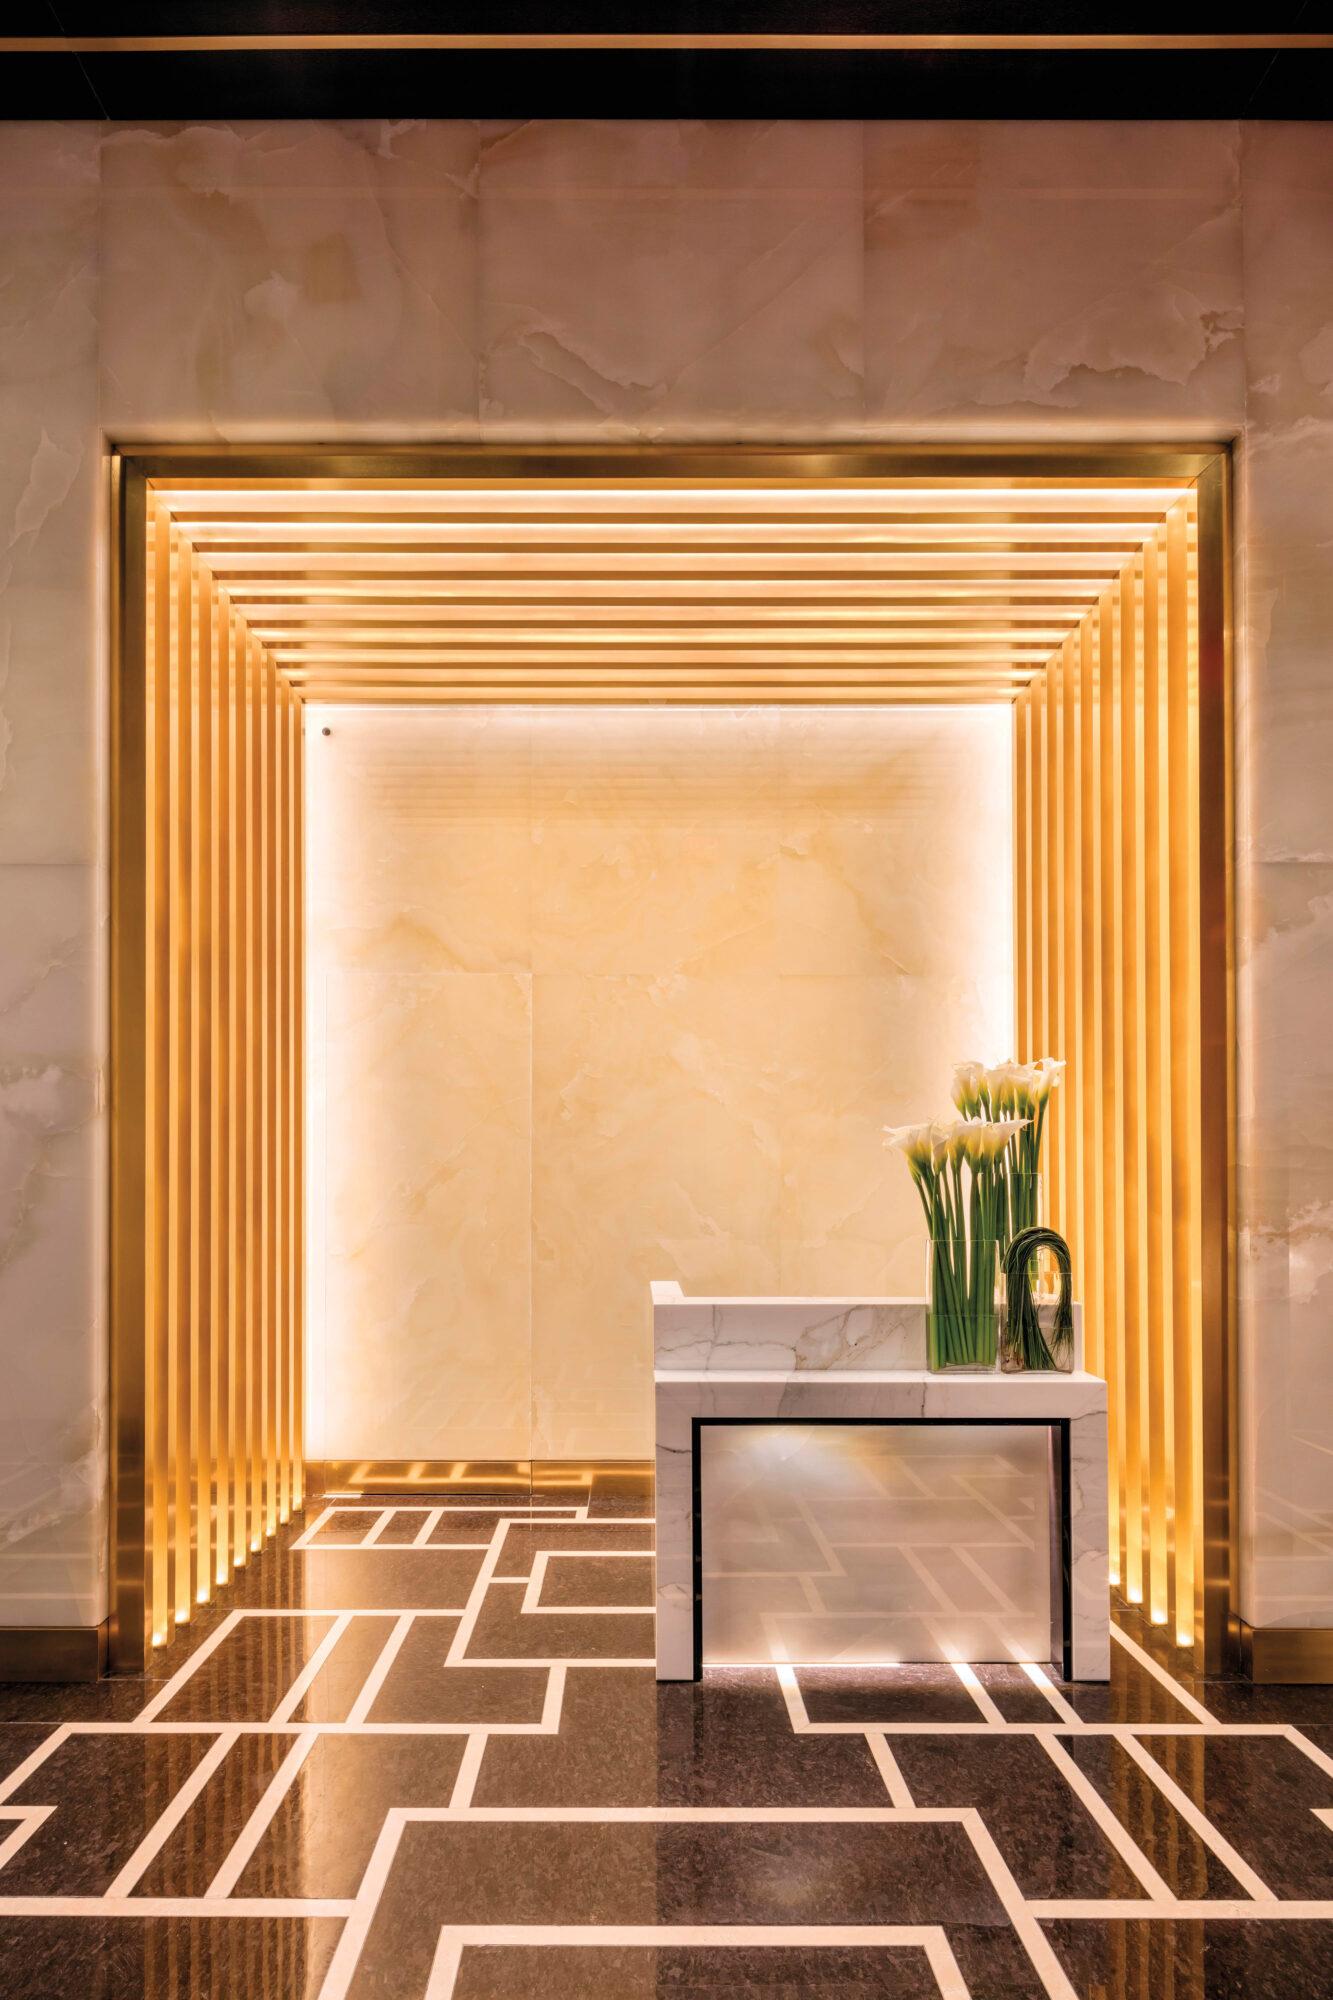 foyer of hotel with orange glow